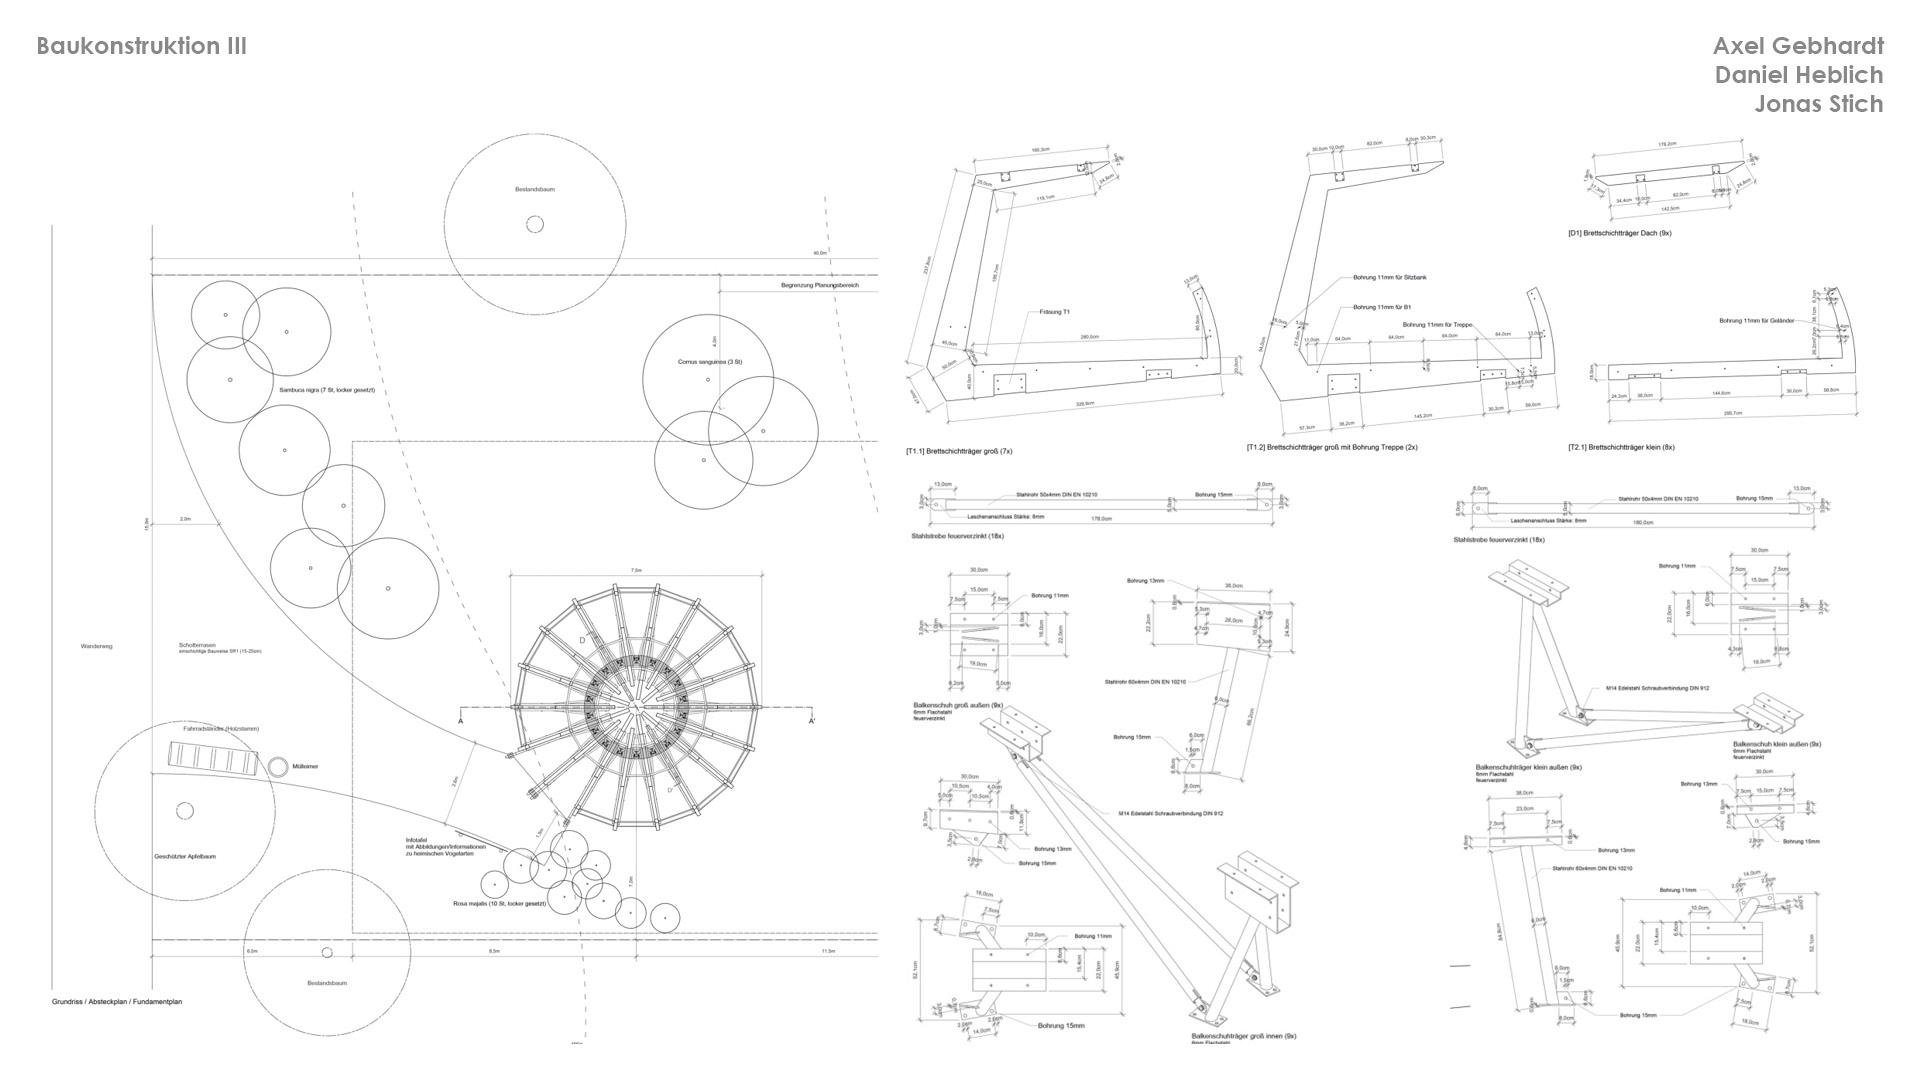 01 2013 3 BaukonstruktionIII